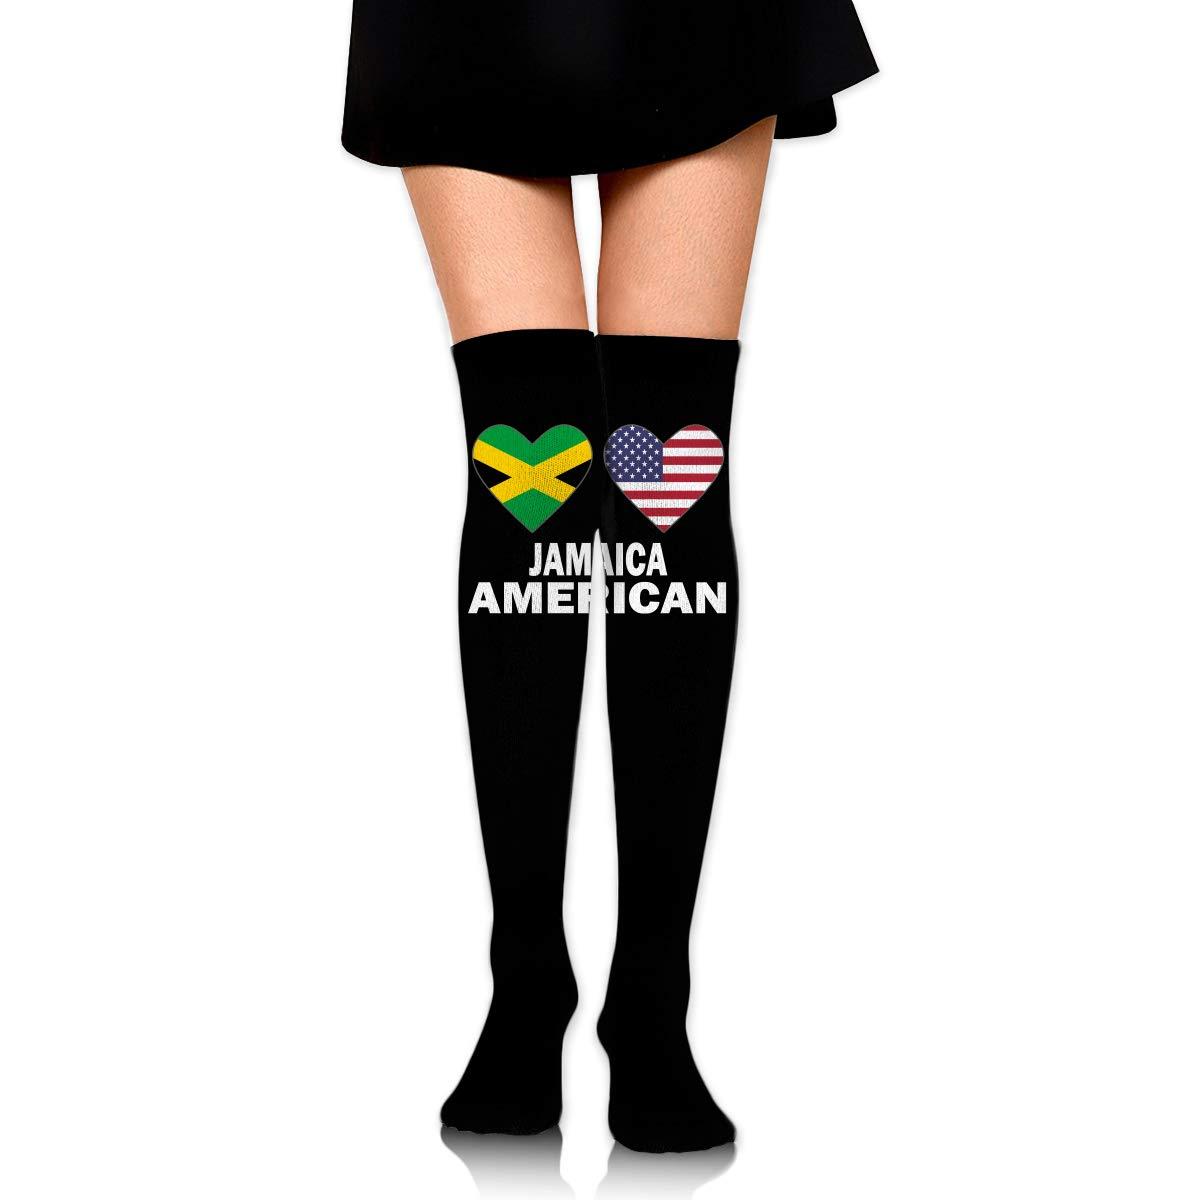 One Size Girls Womens Jamaica American Flag Hearts Over Knee Thigh High Stockings Fashion Socks